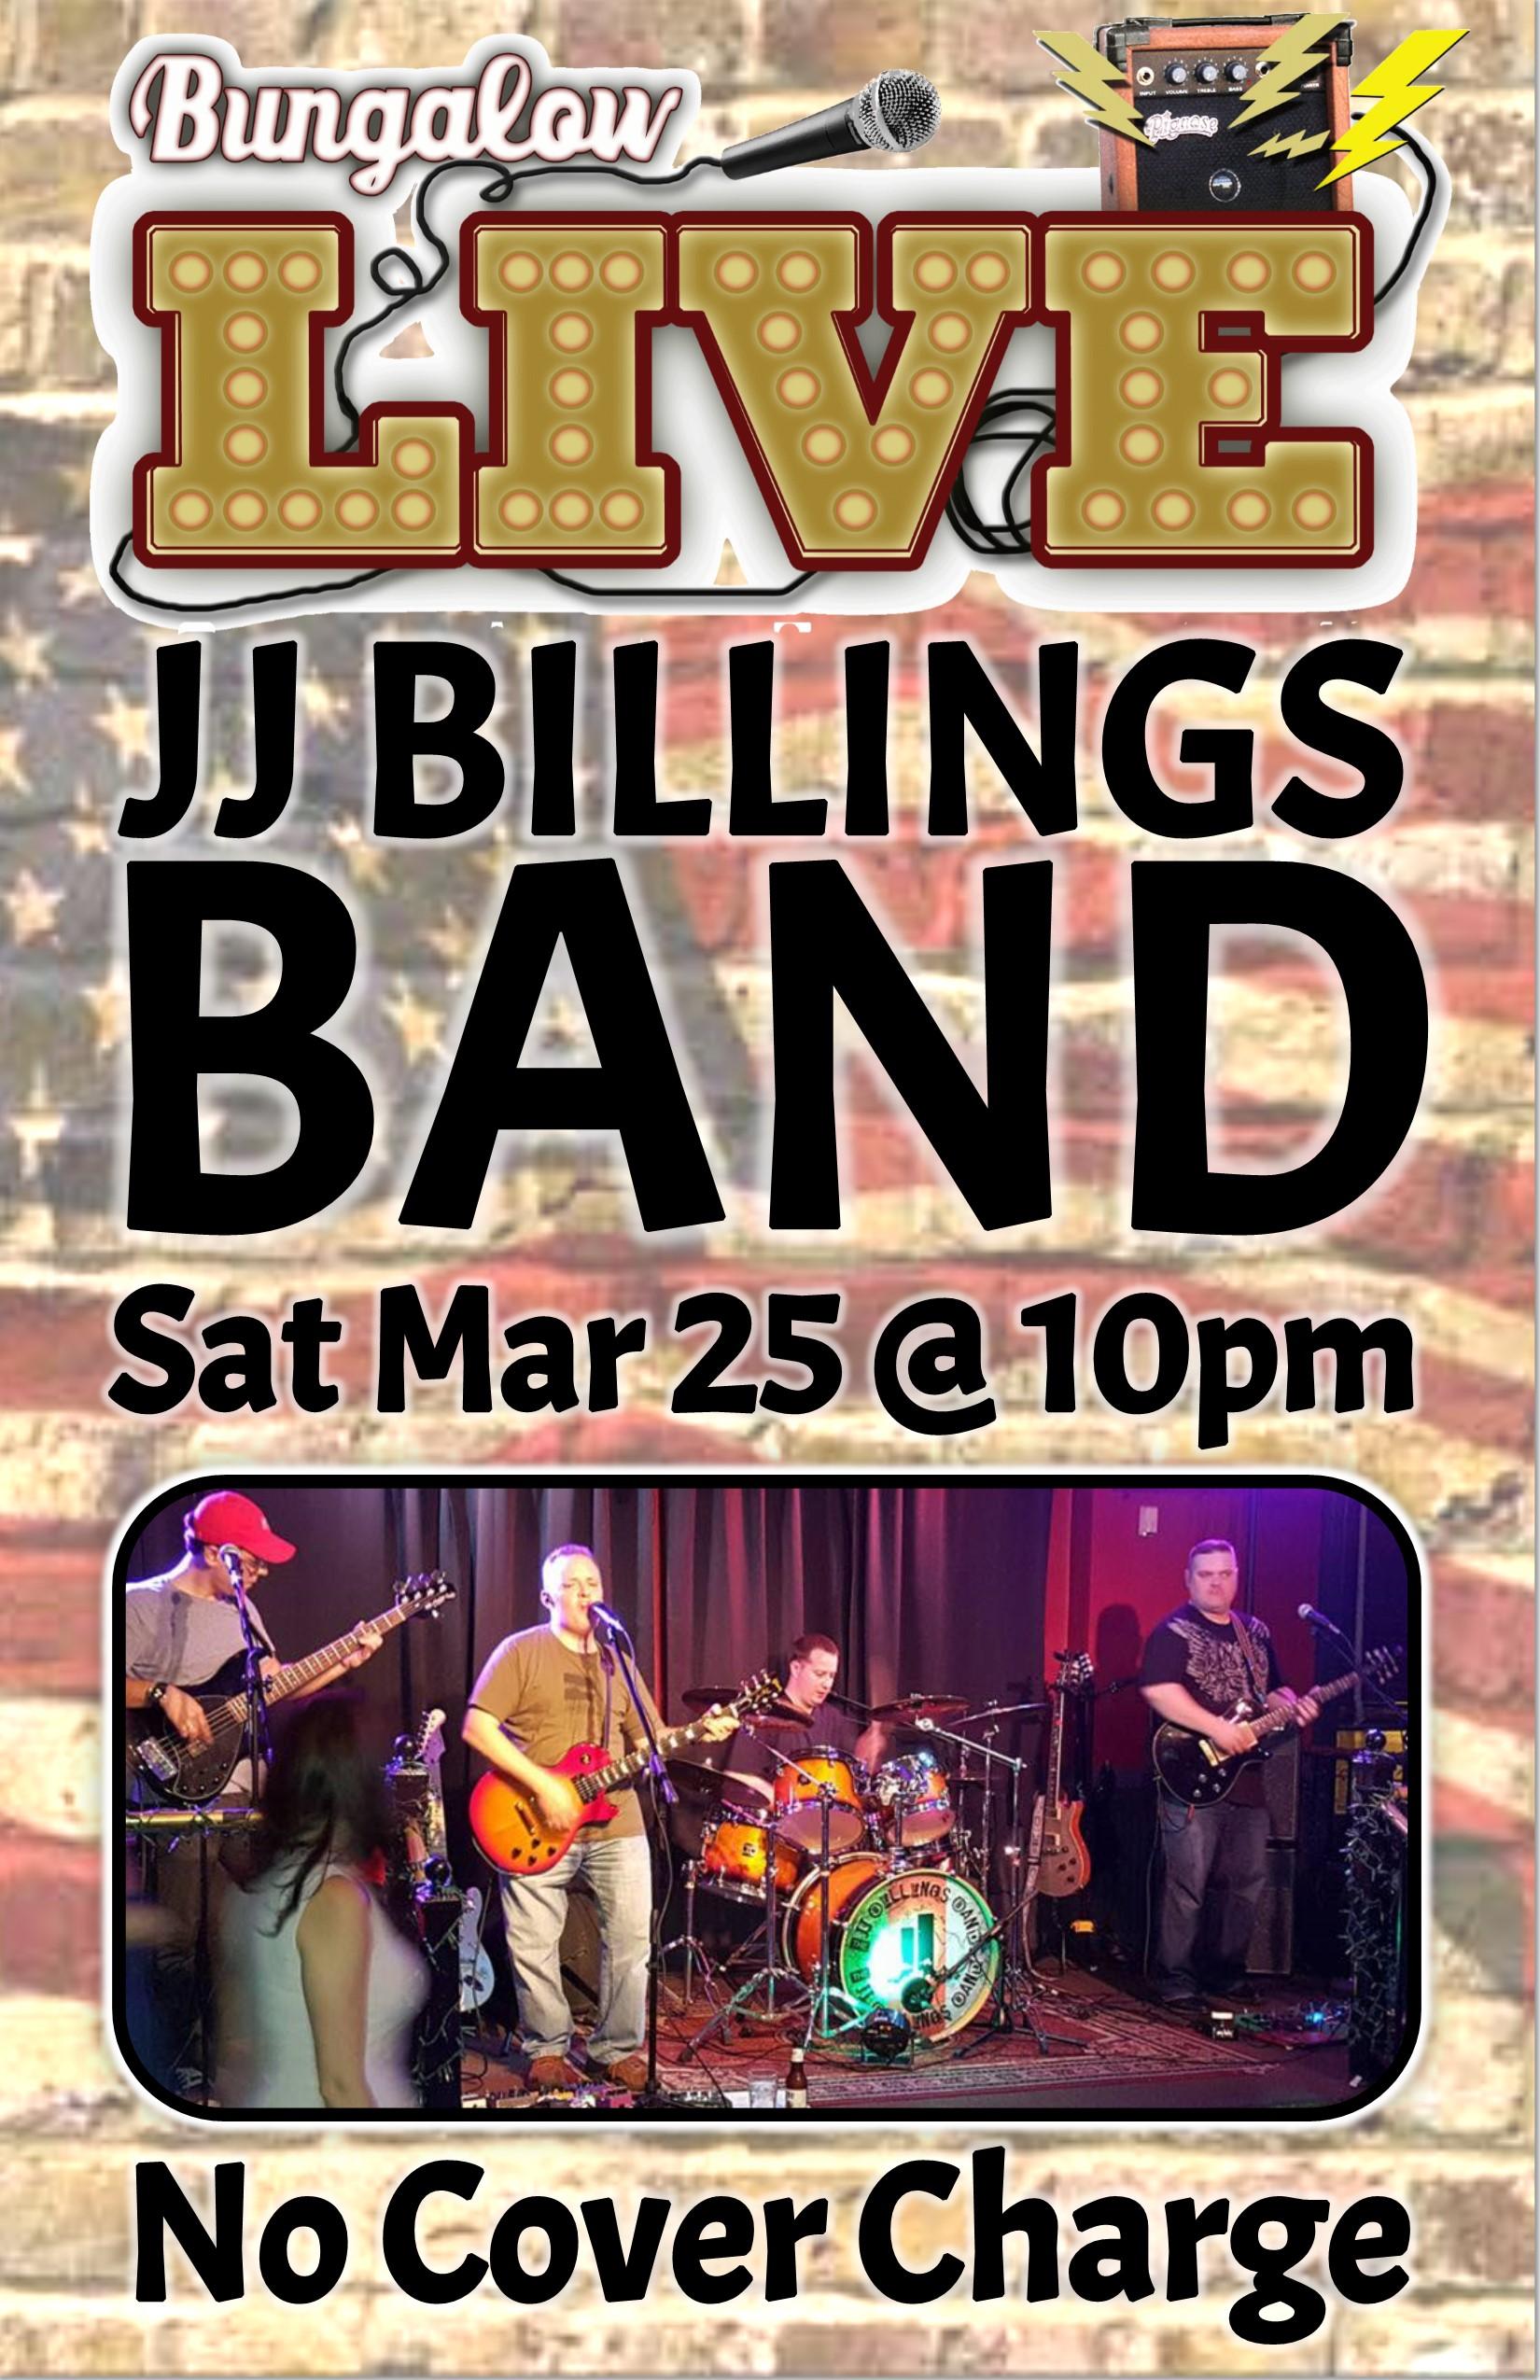 JJ BILLINGS BAND